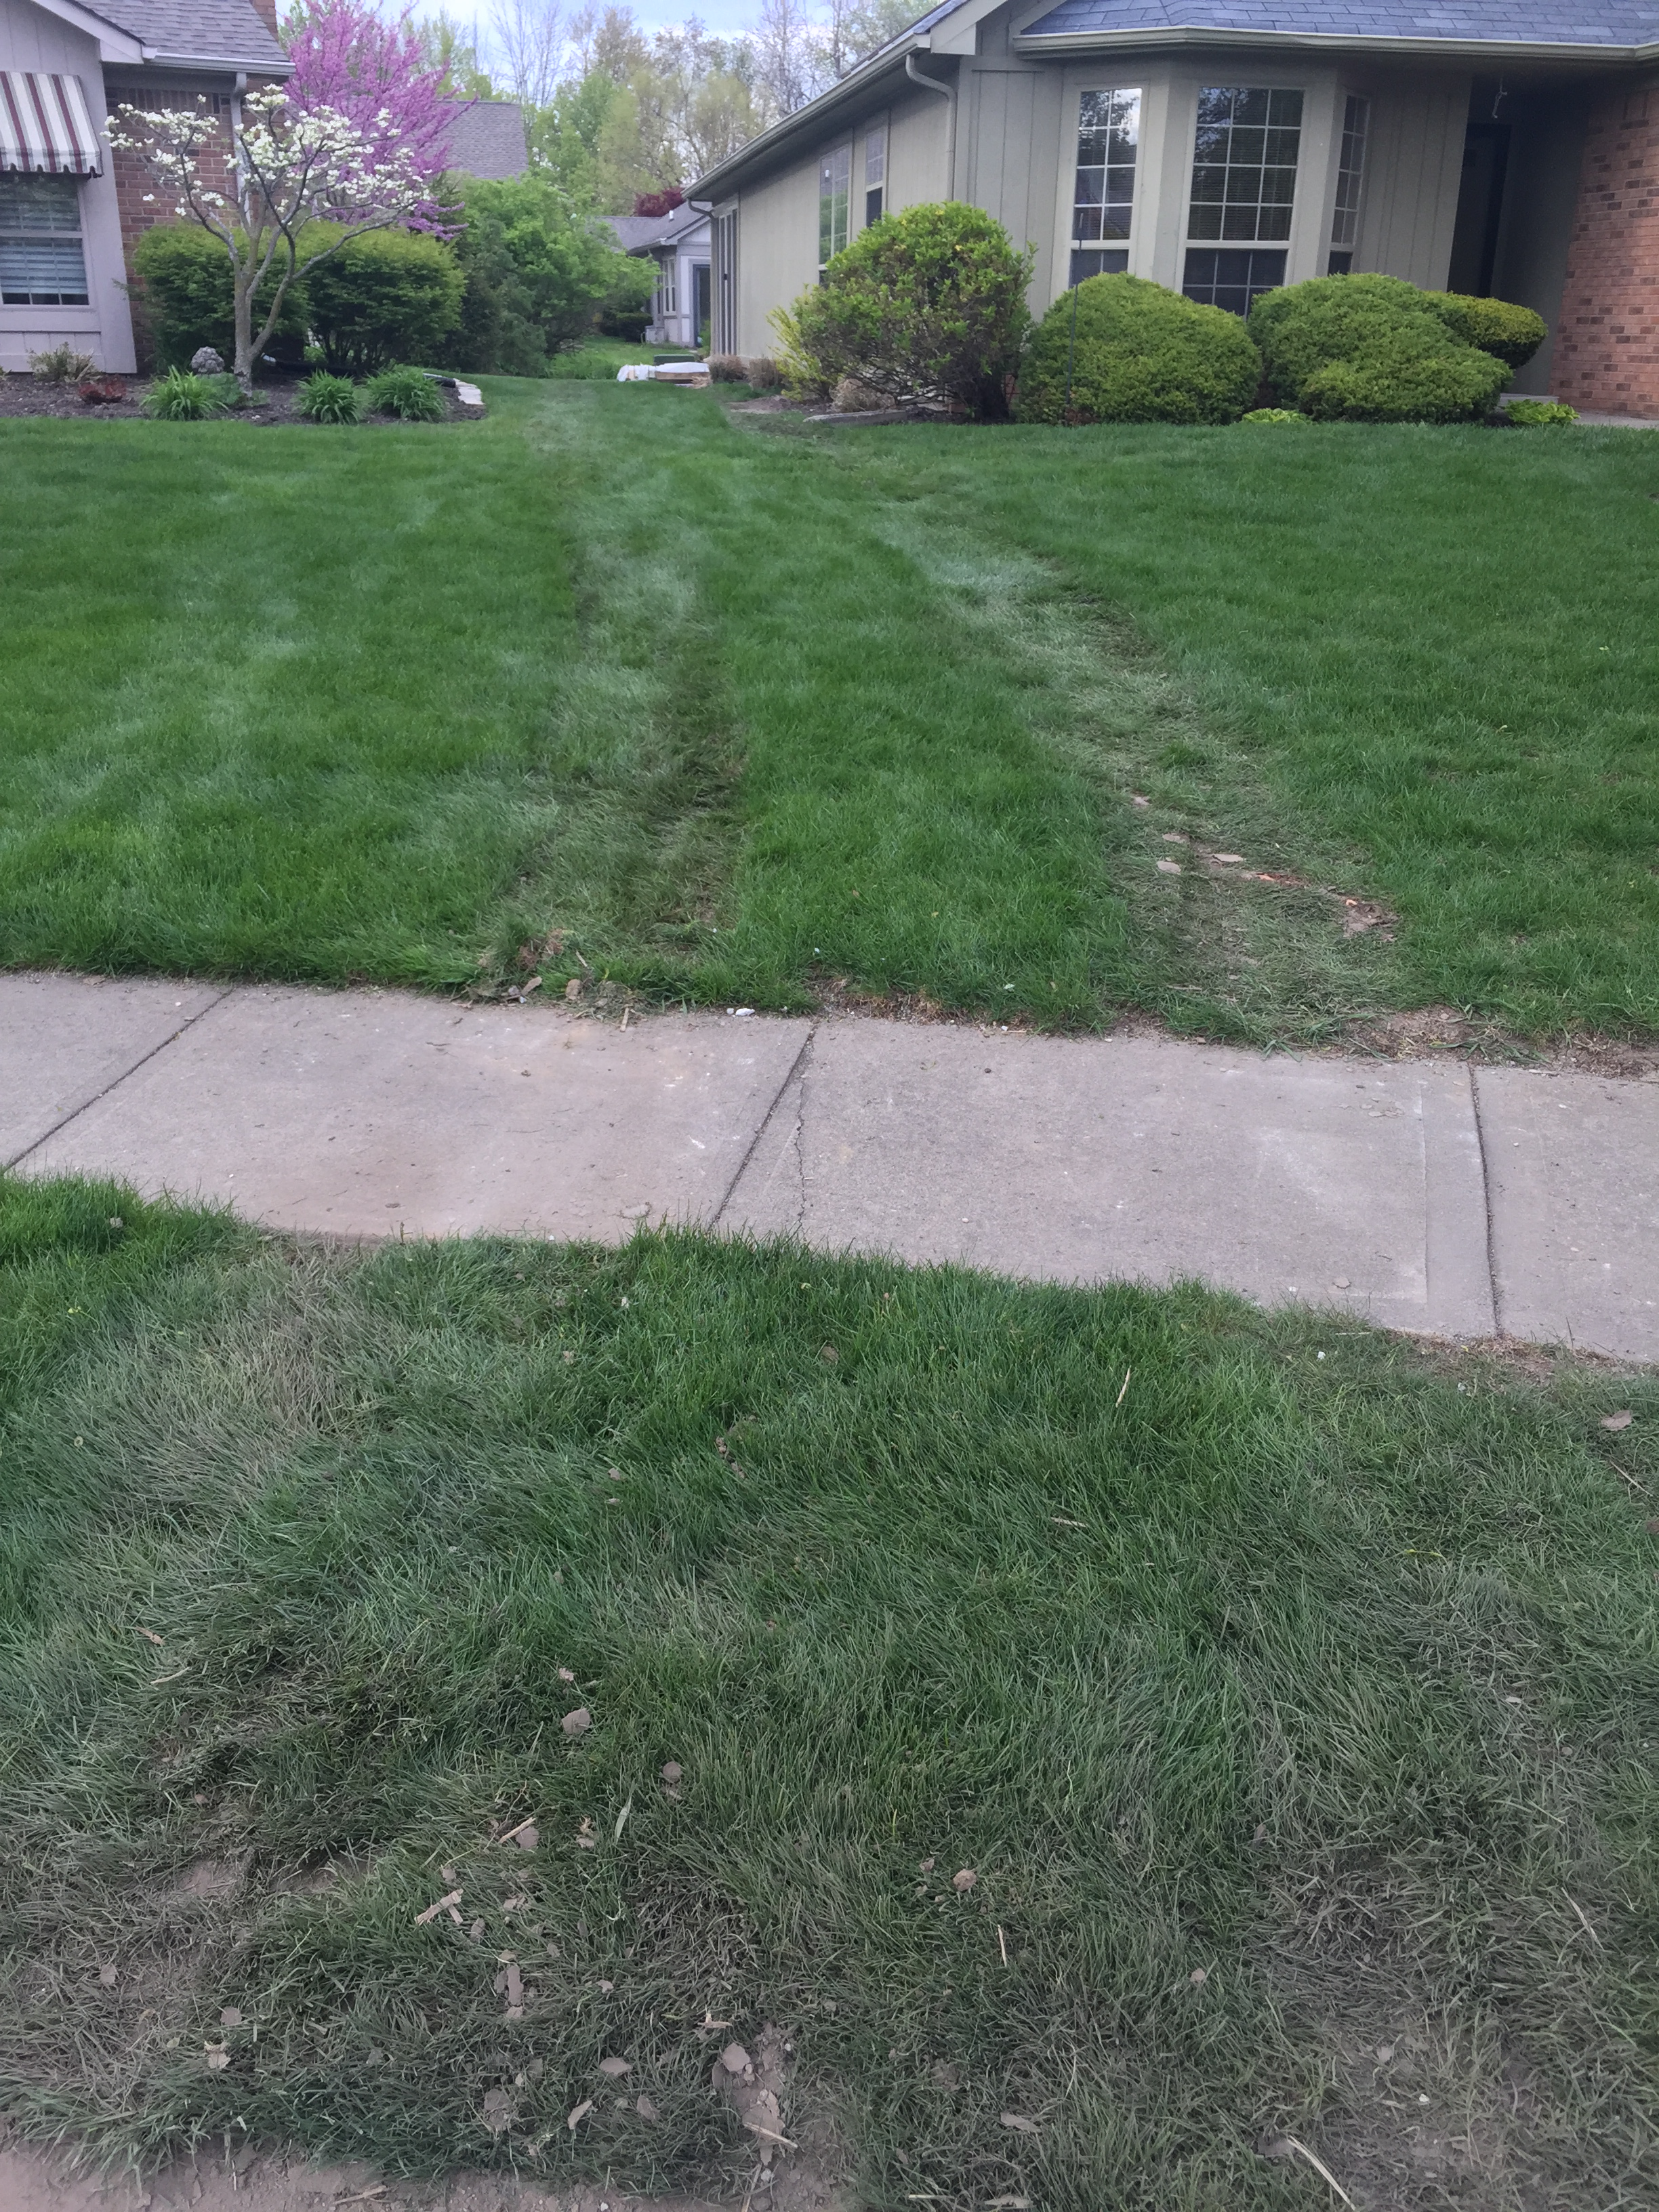 Tracks in yard...